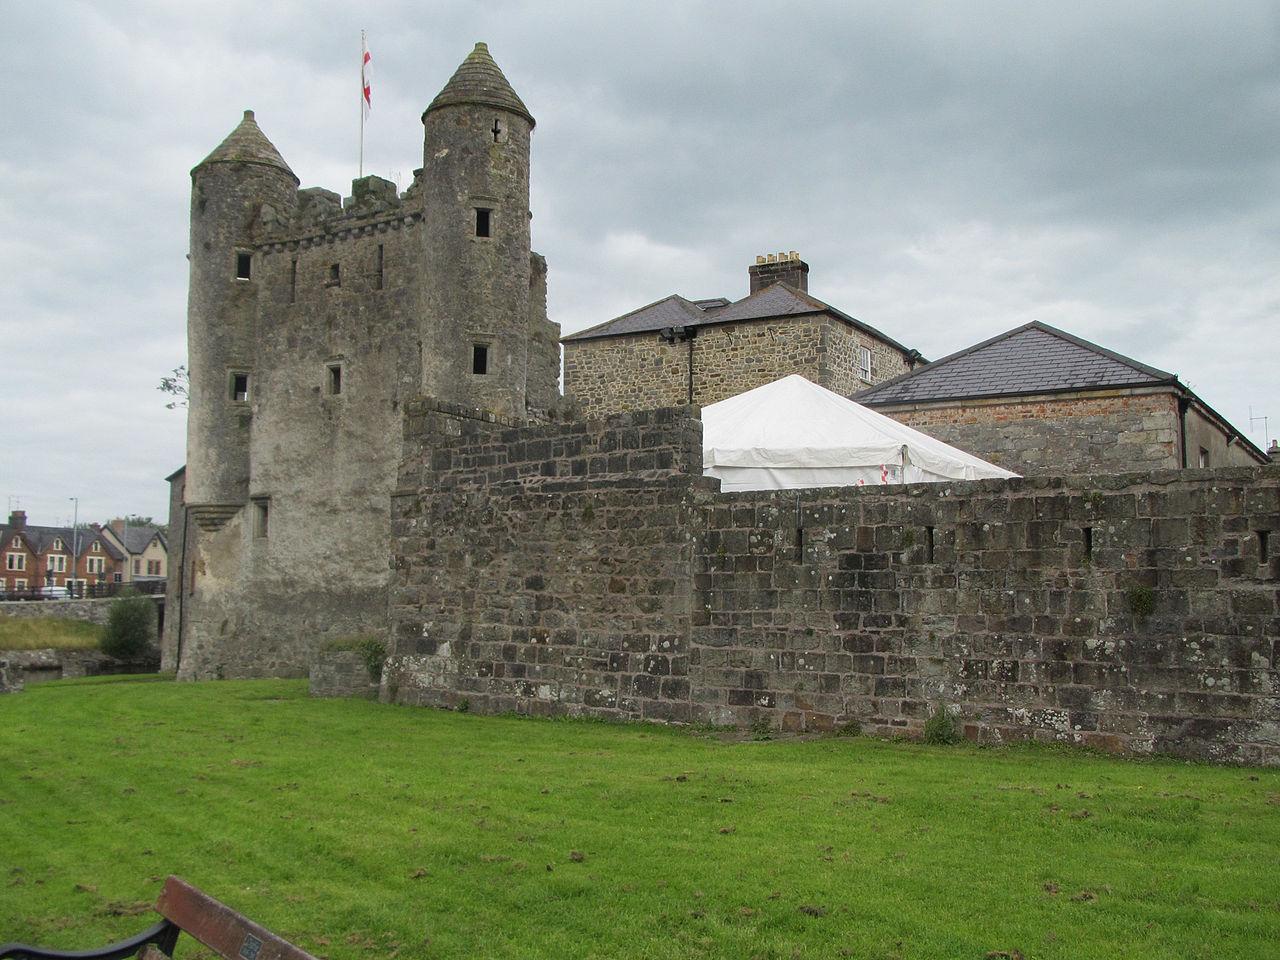 Enniskillen castle on a cloudy day